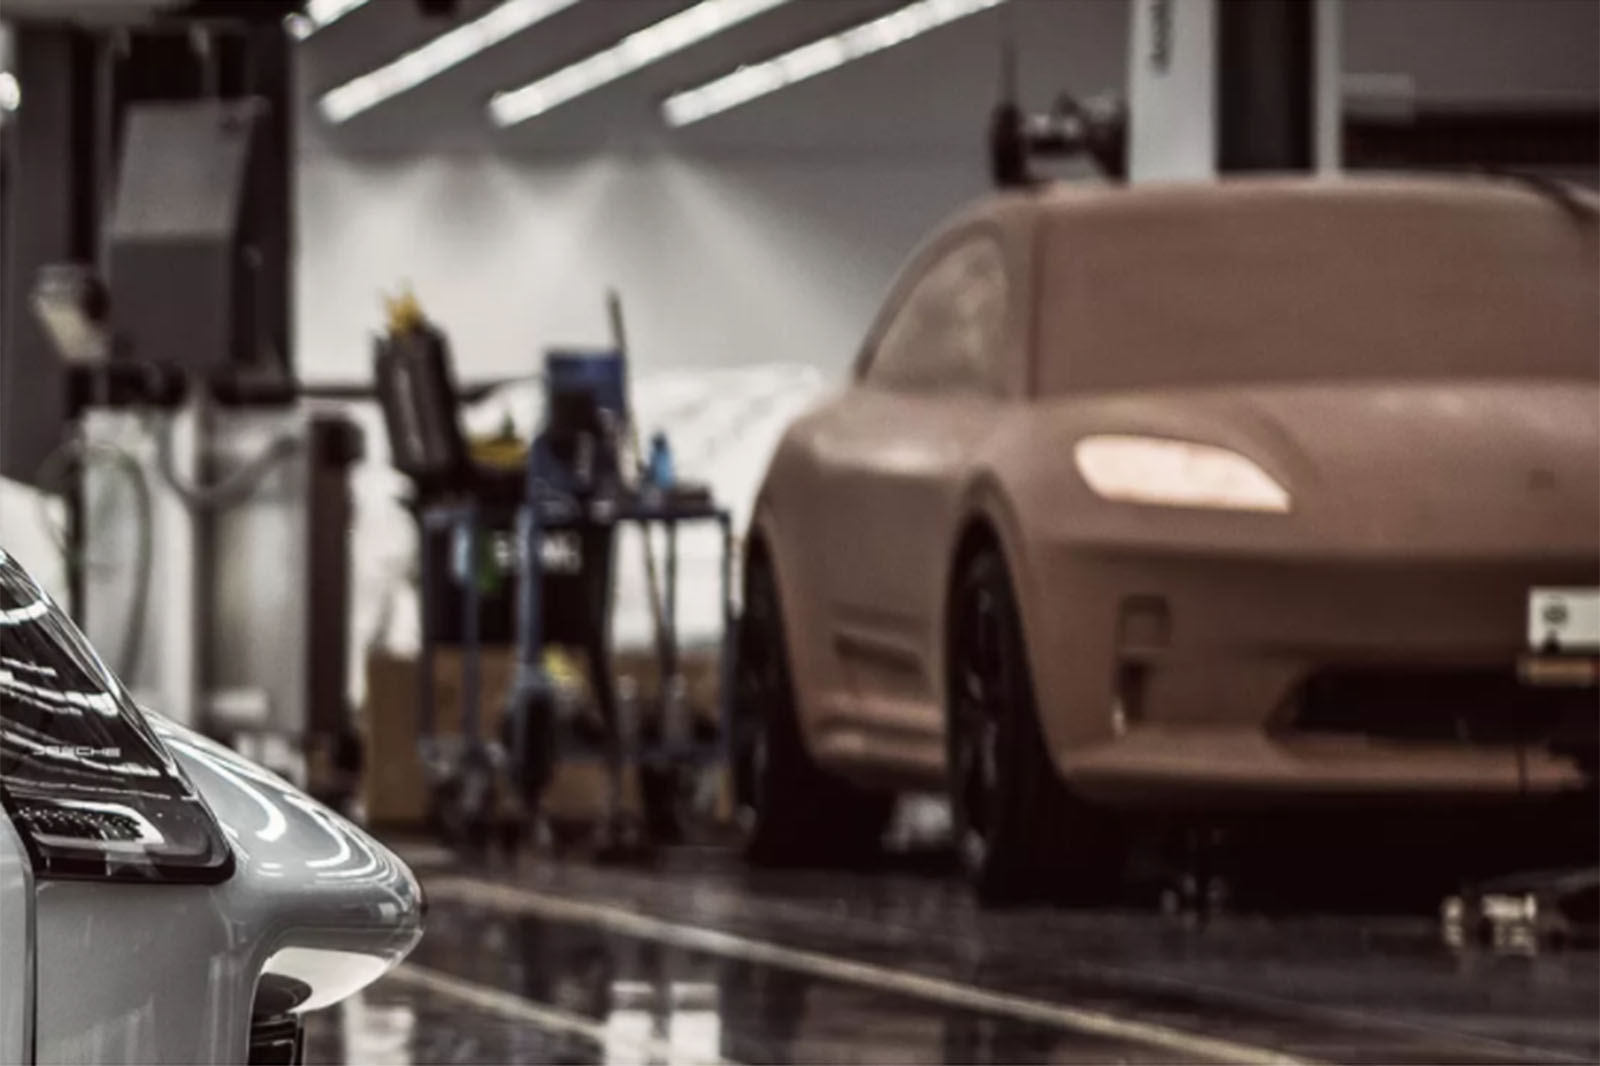 porsche 115 - New Porsche Macan EV previewed in design model - New Porsche Macan EV previewed in design model